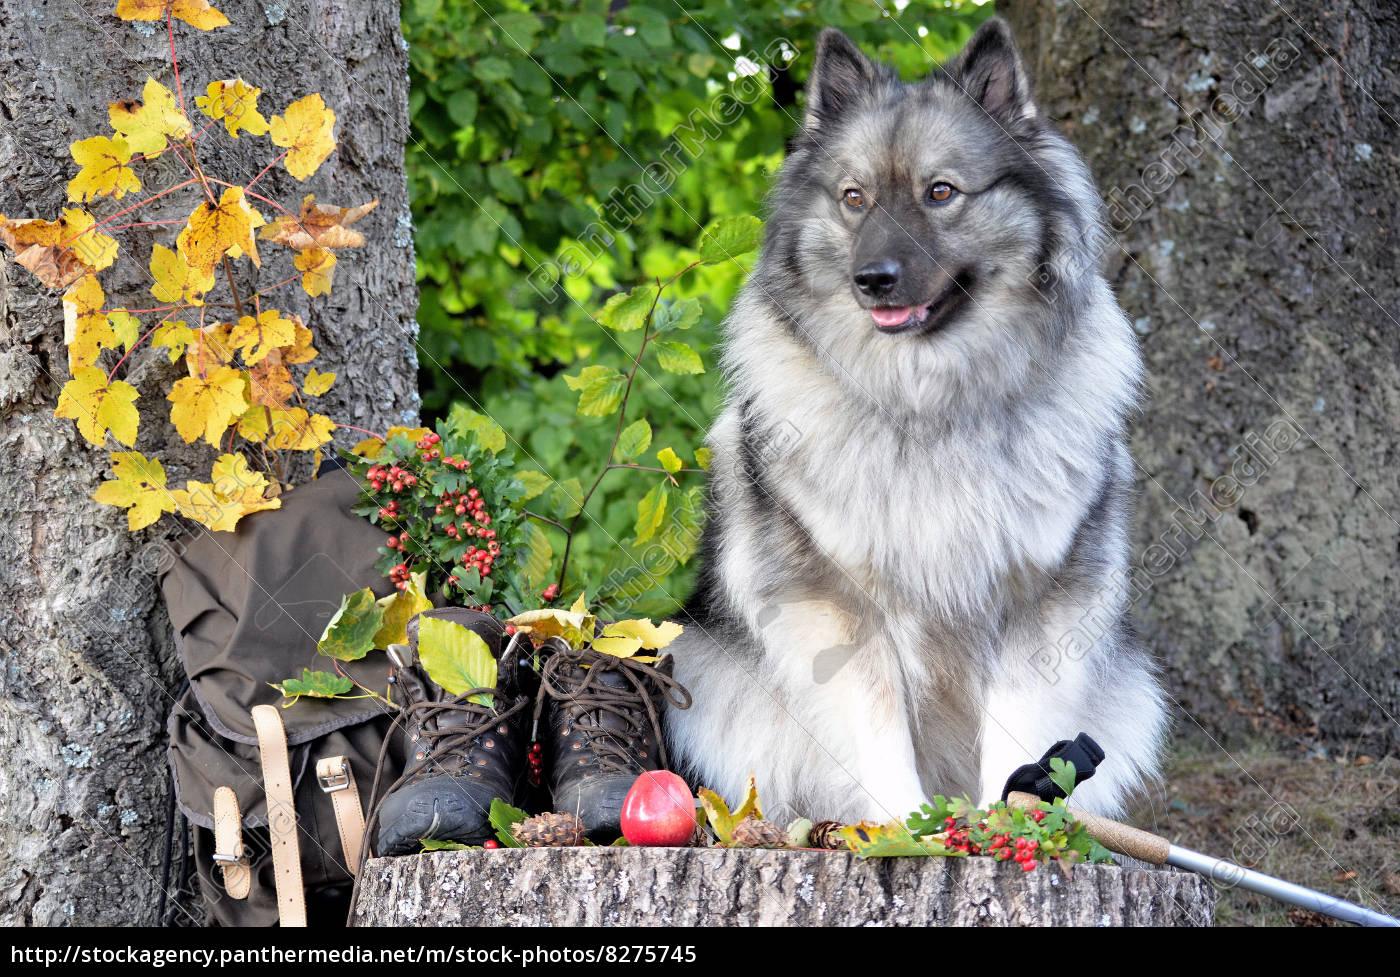 Lizenzfreies Bild 8275745 Hund Herbst Pause Wandern